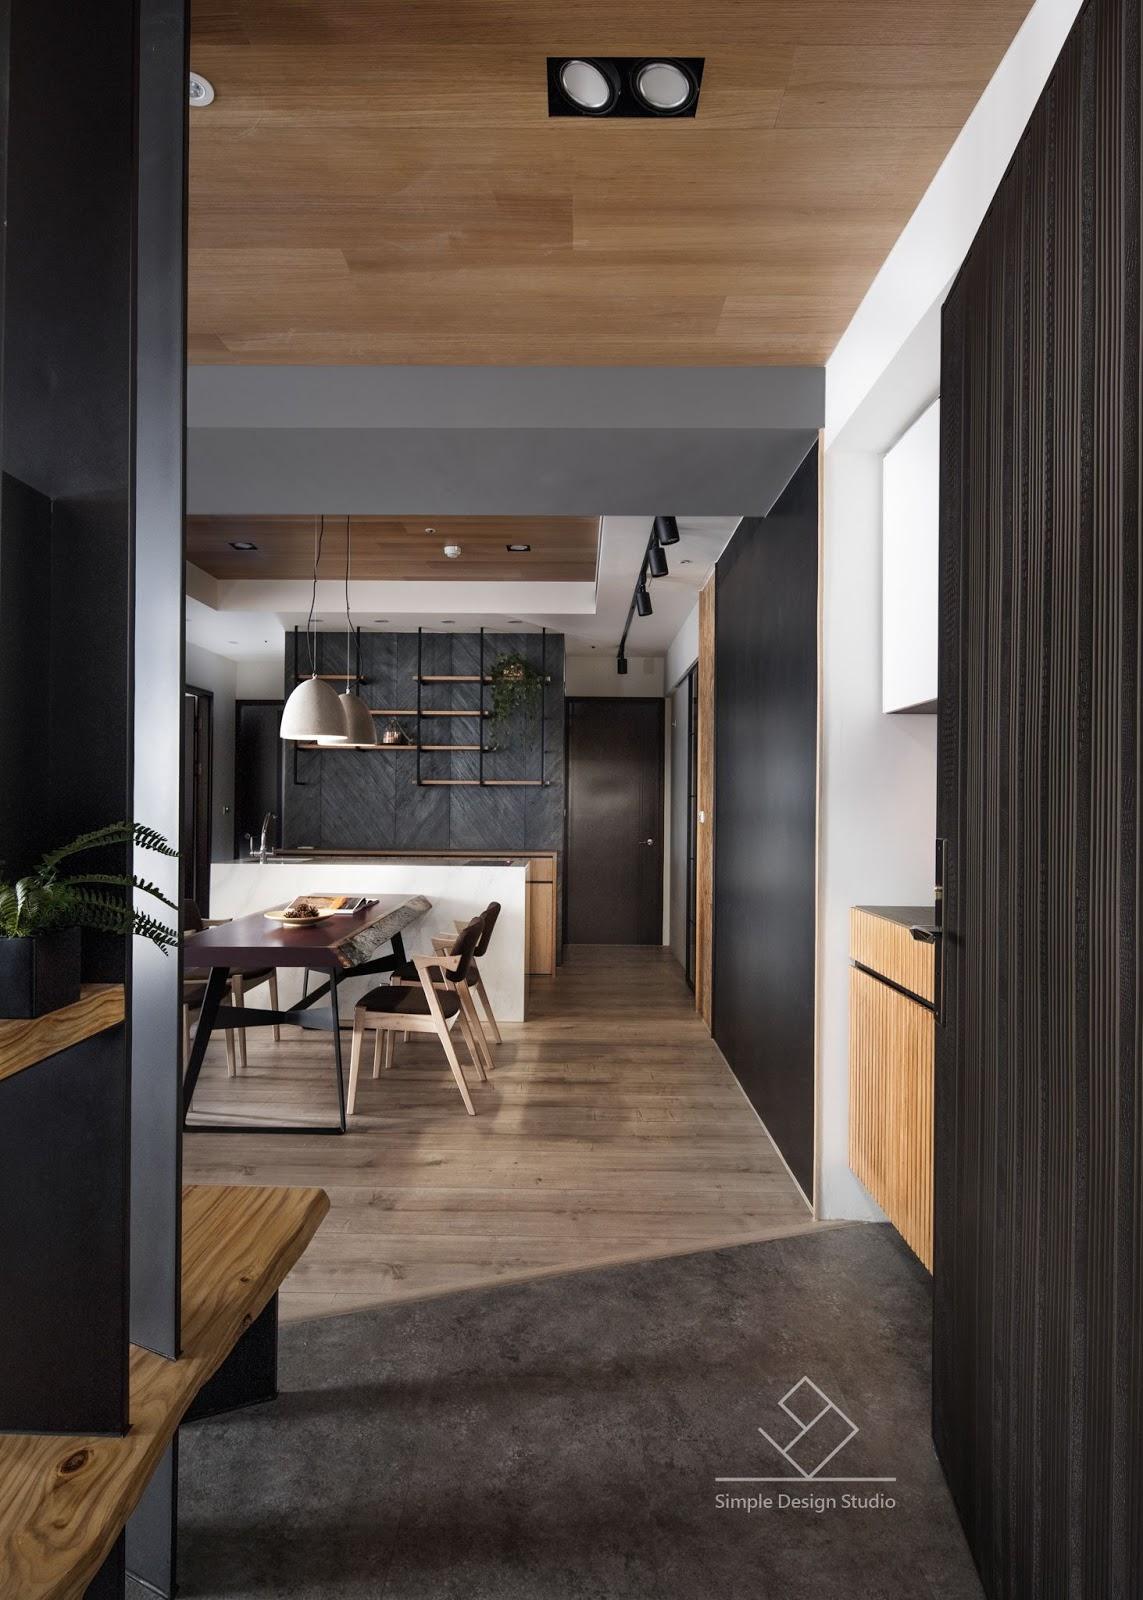 Simple Design Studio - 極簡室內設計: 室內設計作品:S&C秘境《翰林富苑》